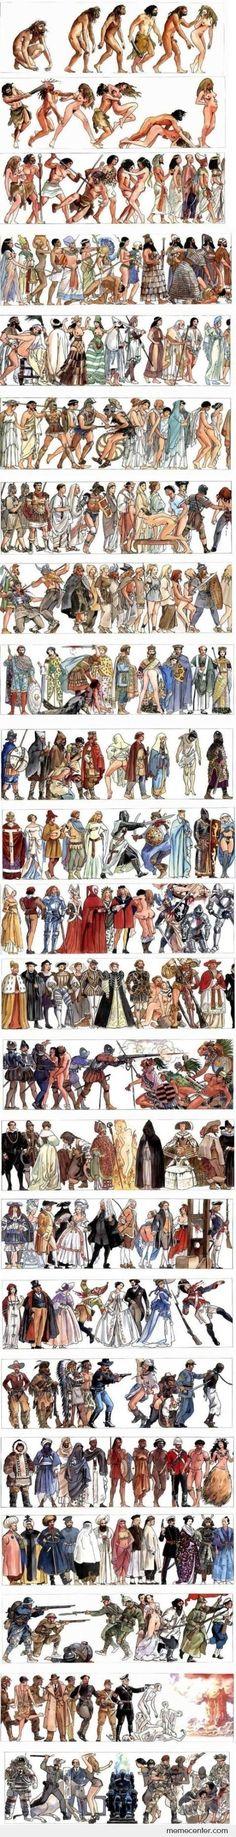 Illustrated history of mankind